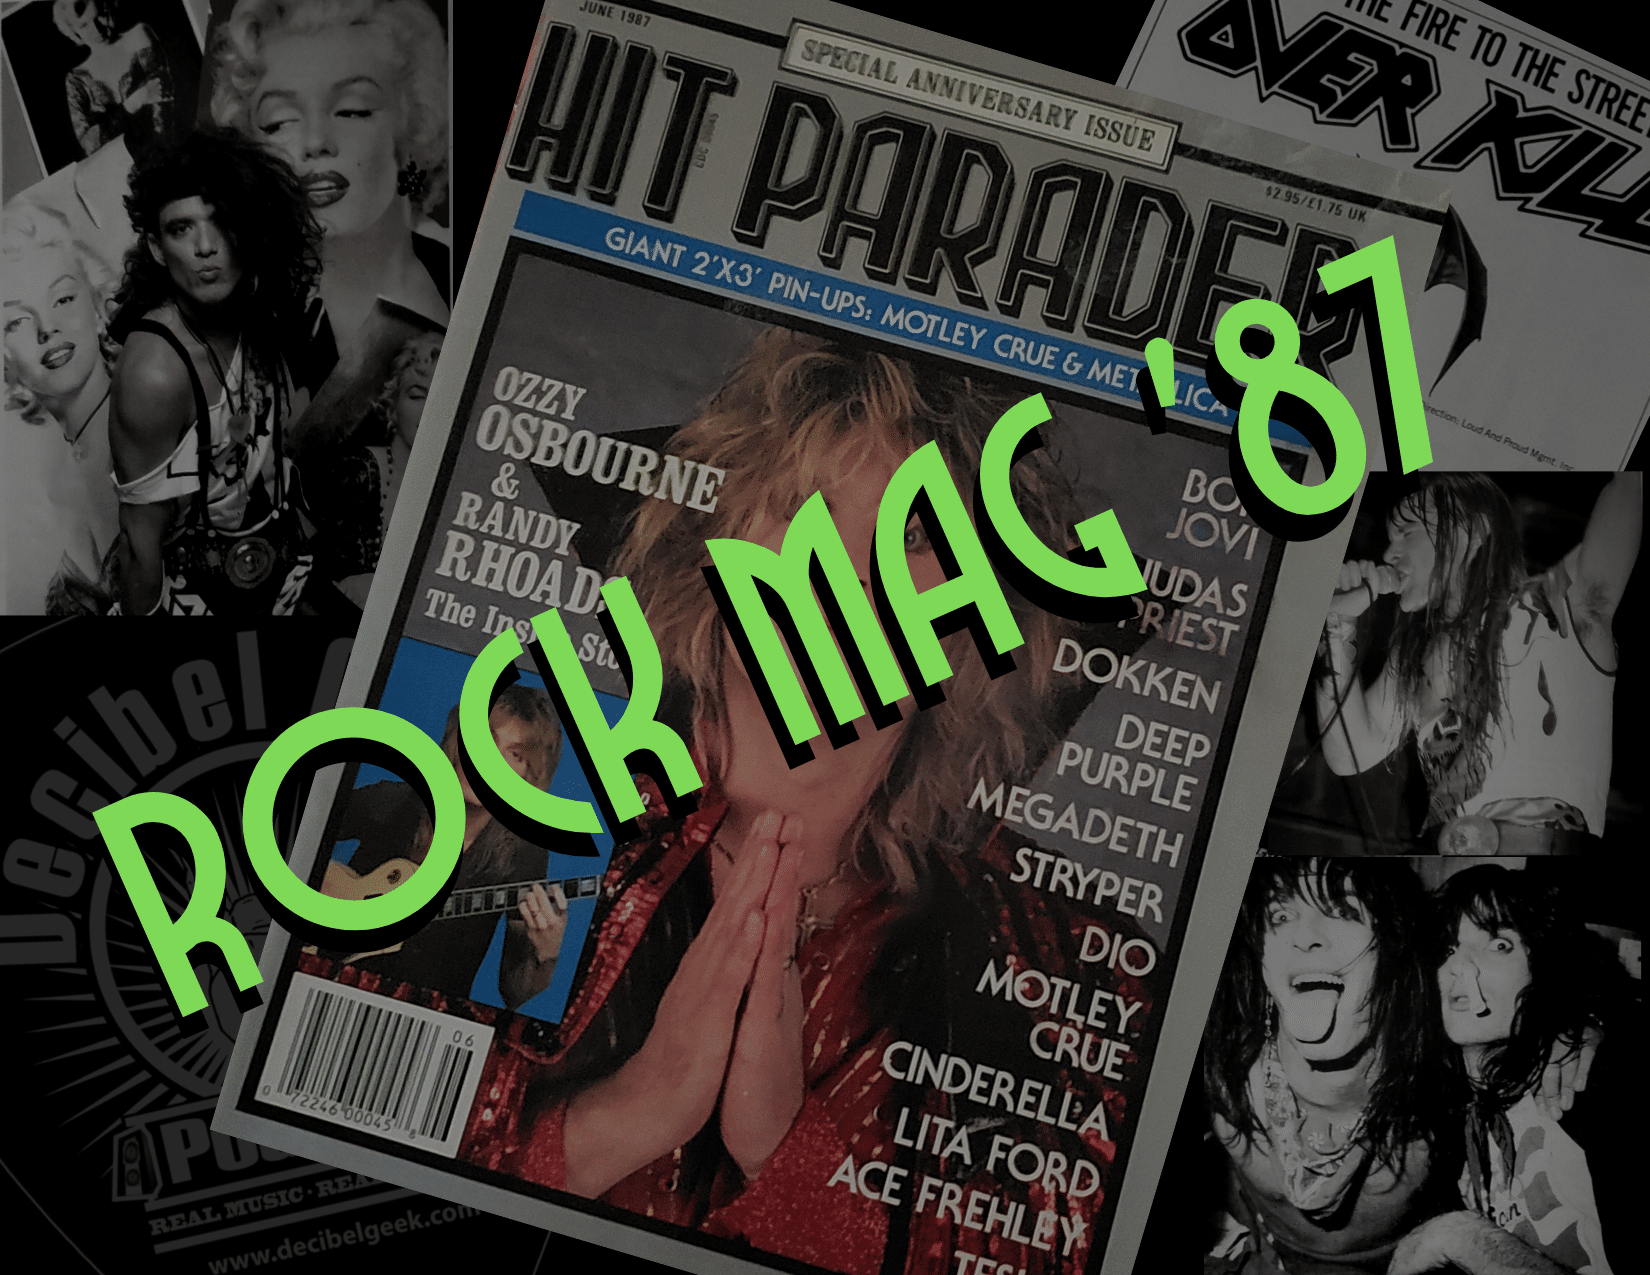 rock mag 87, hit parader, hard rock, heavy metal, music